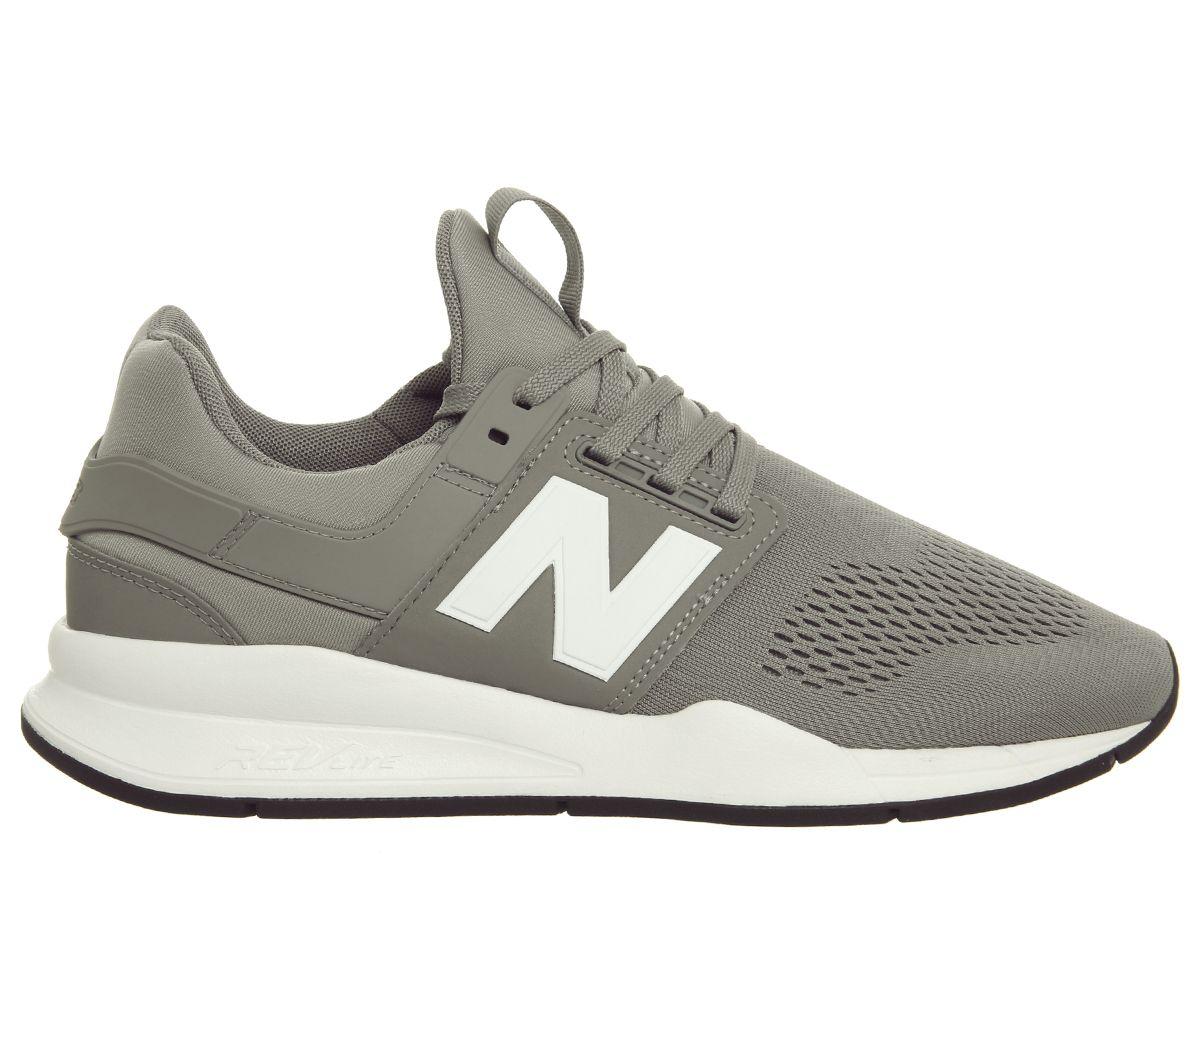 New-Balance-247V2-Baskets-Marblehead-Baskets-Chaussures miniature 4